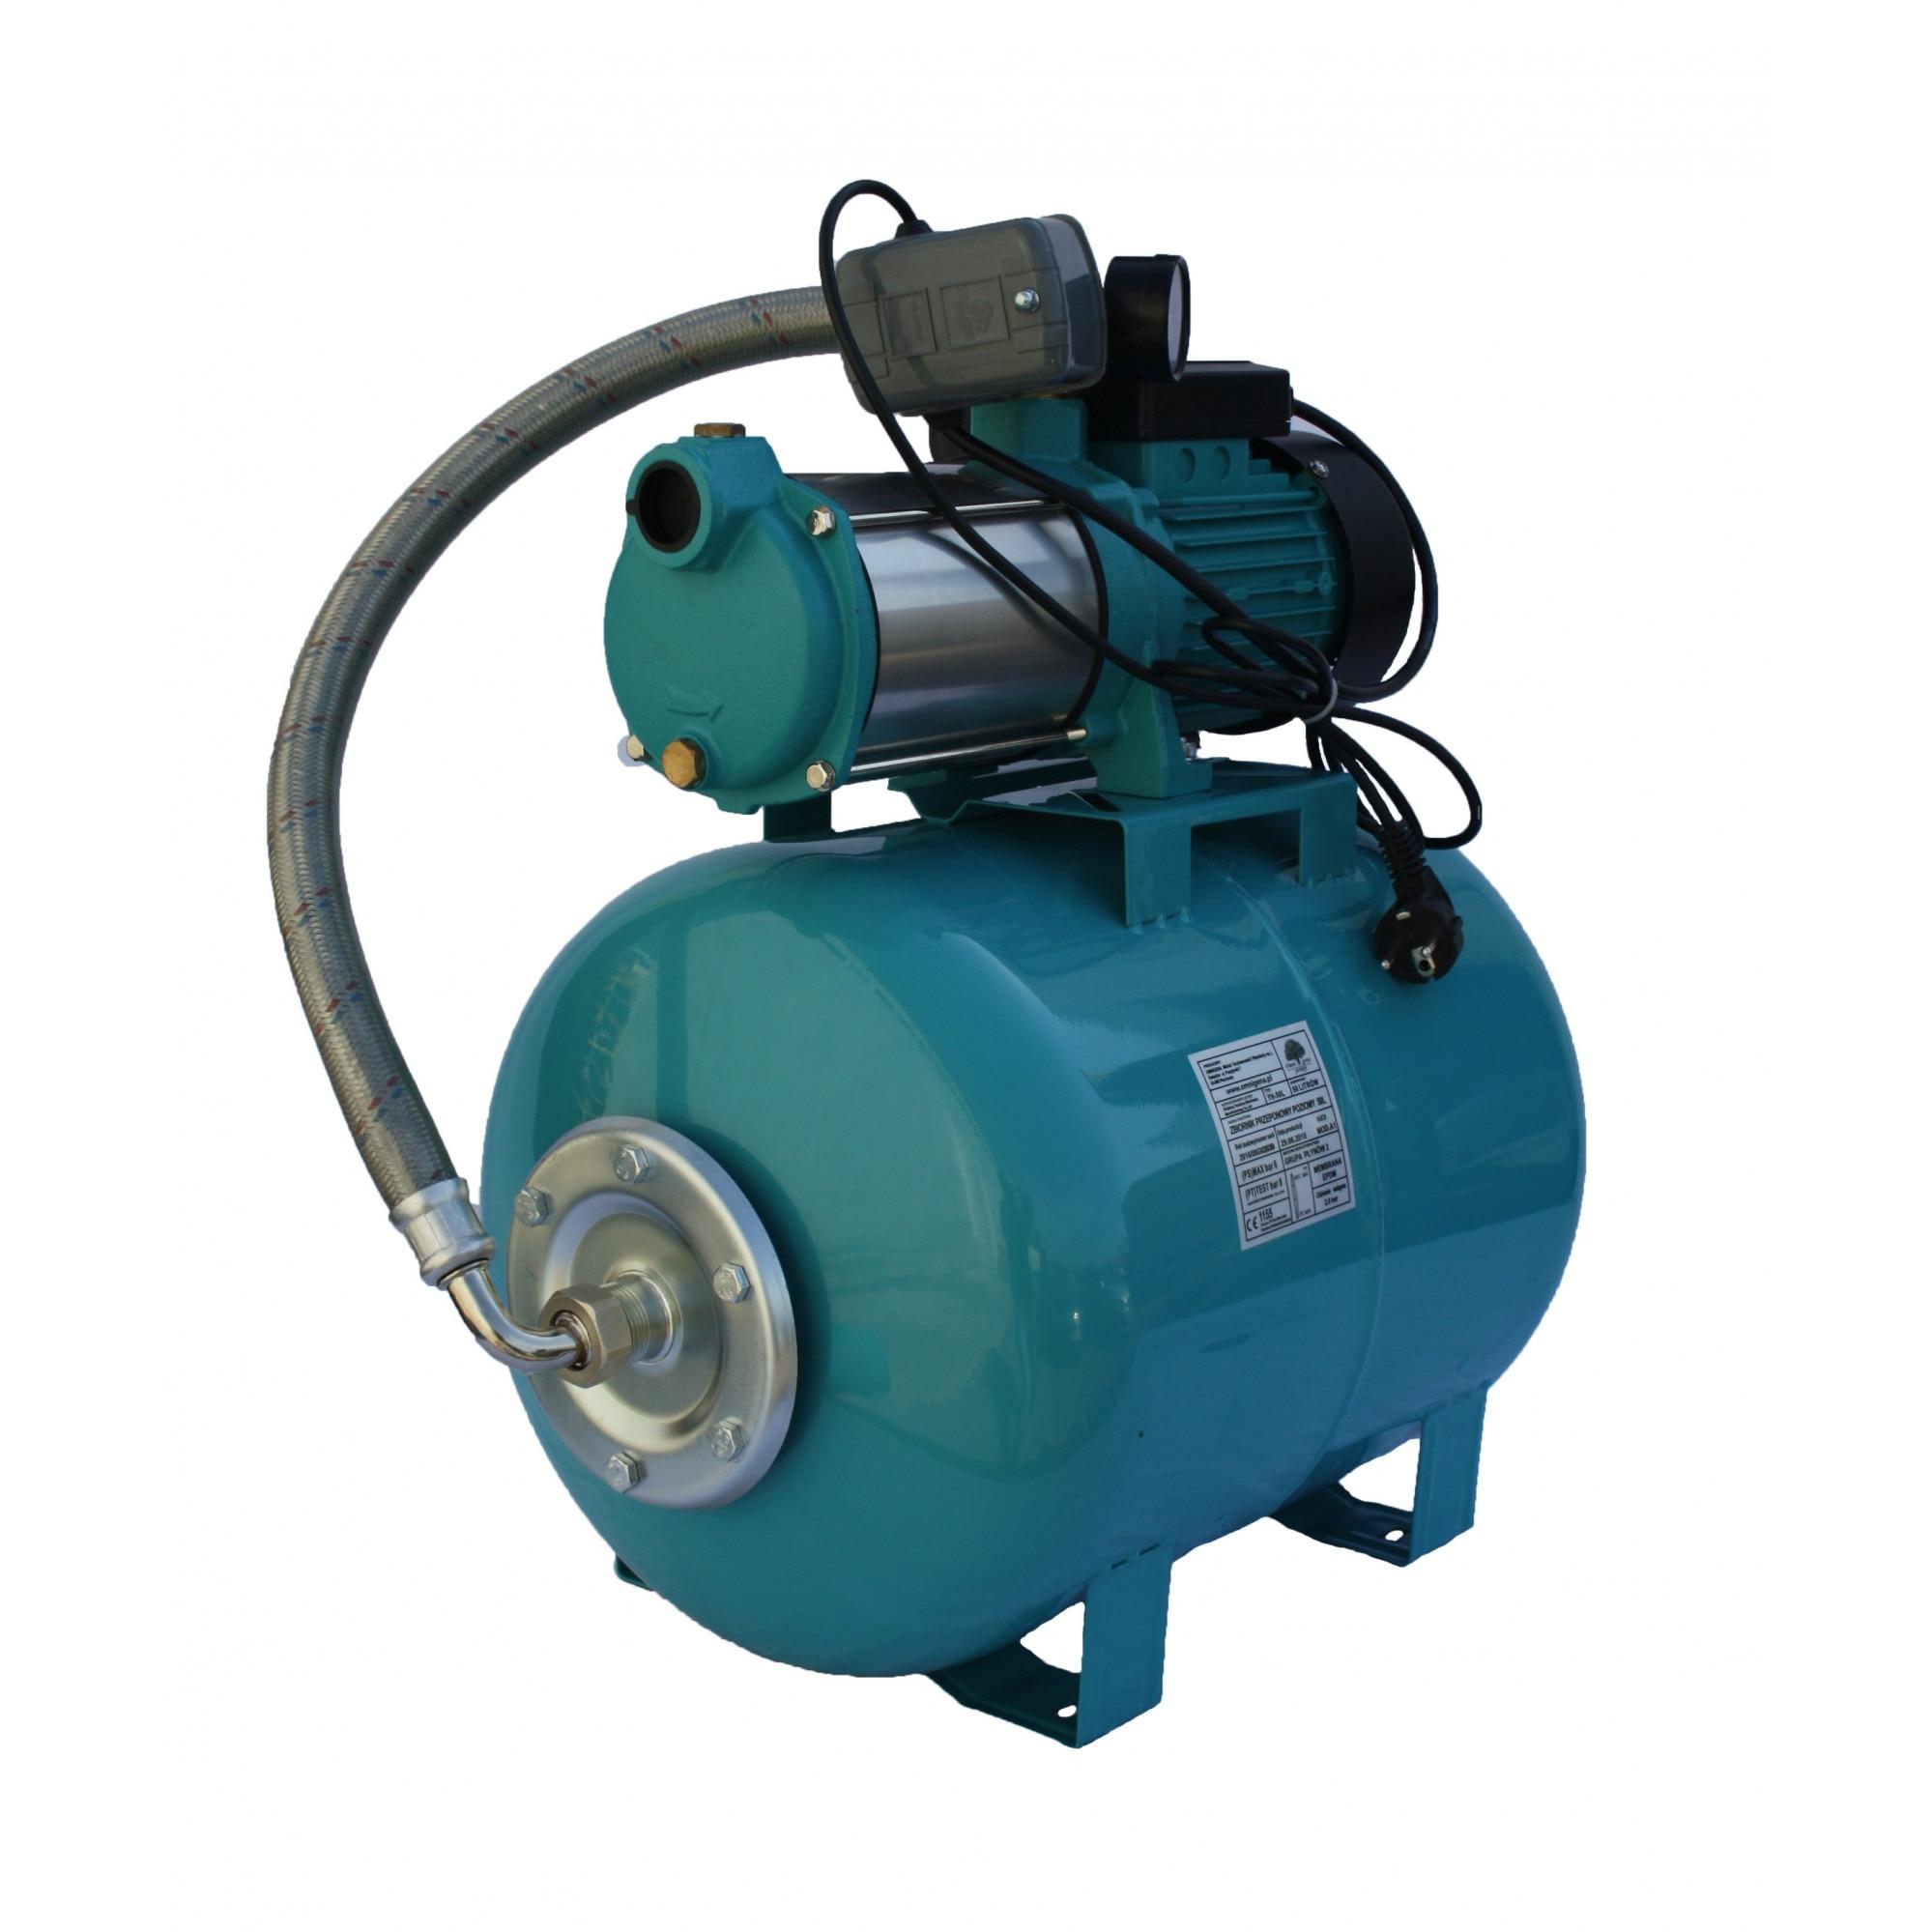 "Fotografie Hidrofor apa curata Omnigena OM5006/100, 2200 W, 100 l capacitate vas expansiune, 170 l/min debit apa, 58 m inaltime refulare, 8 m adancime absorbtie, 1"" diametru racord"